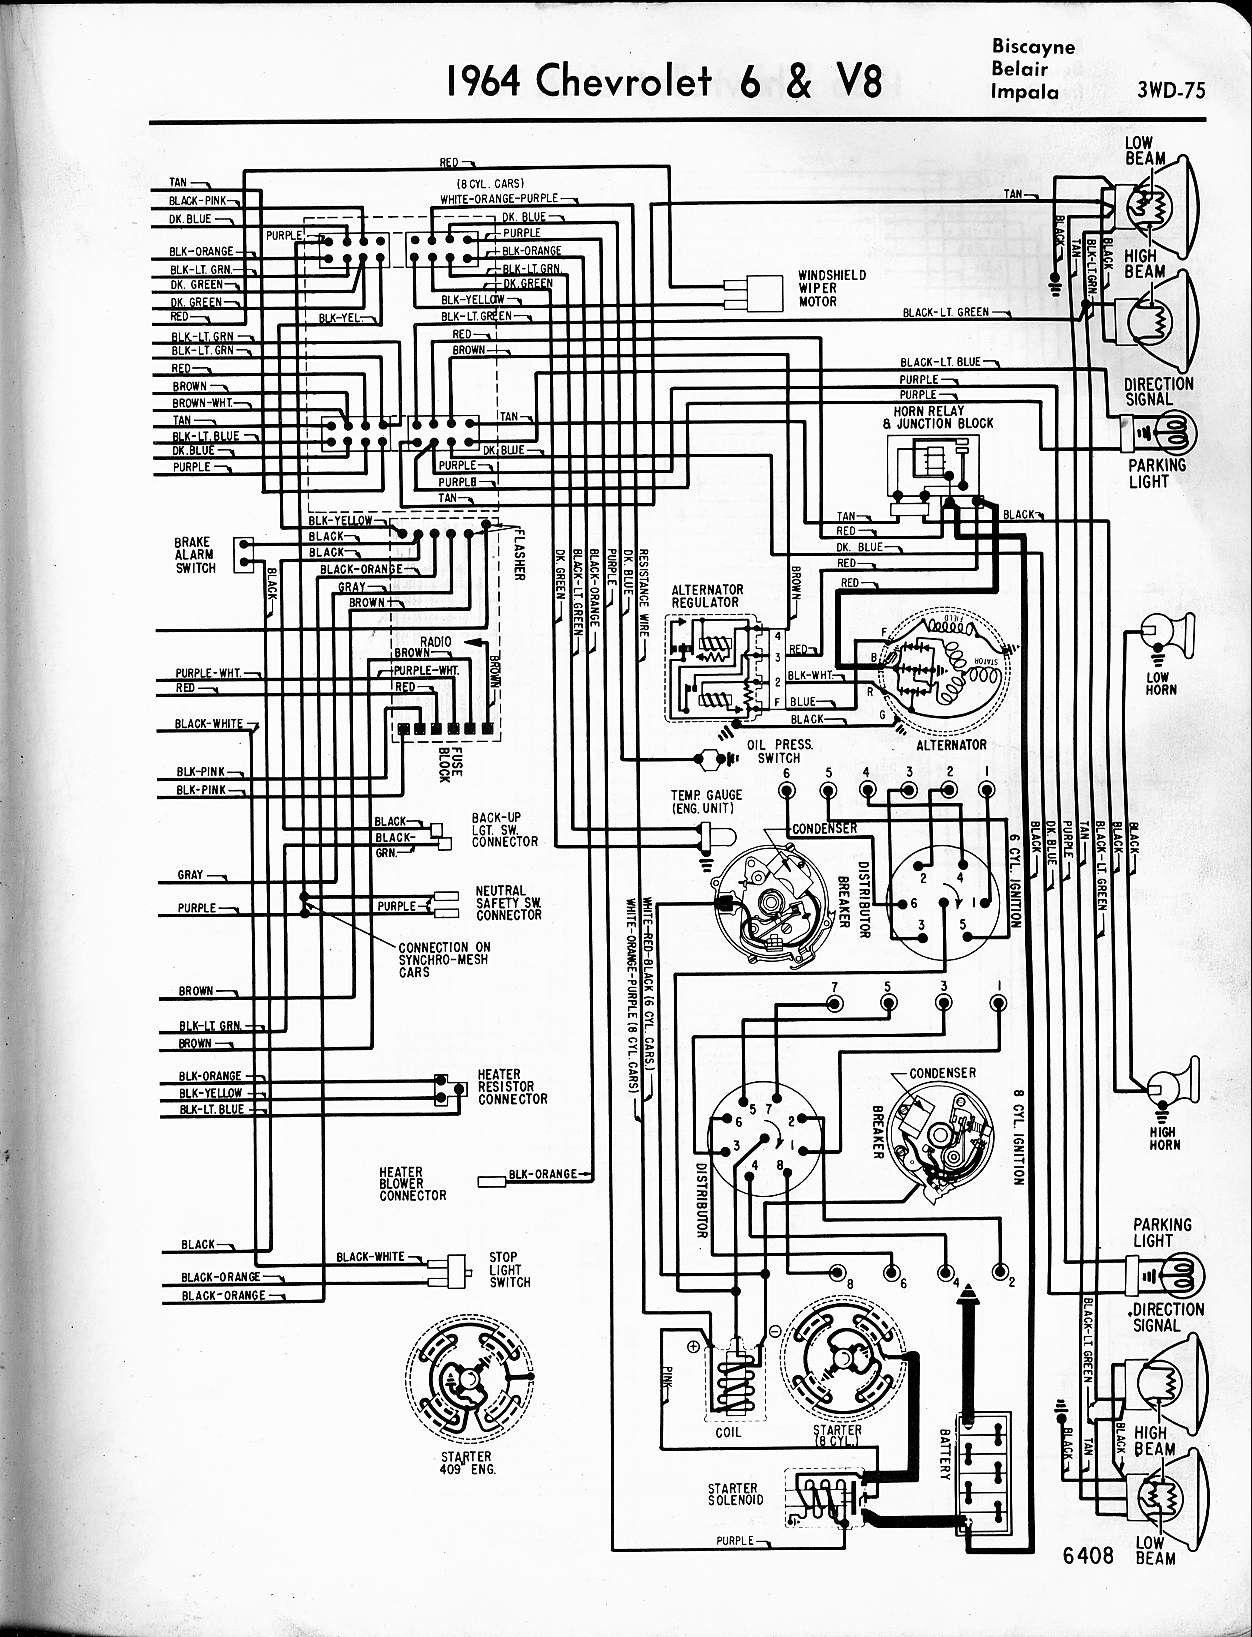 2002 Impala Wiring Diagram In 2021 Chevy Impala Impala Diagram